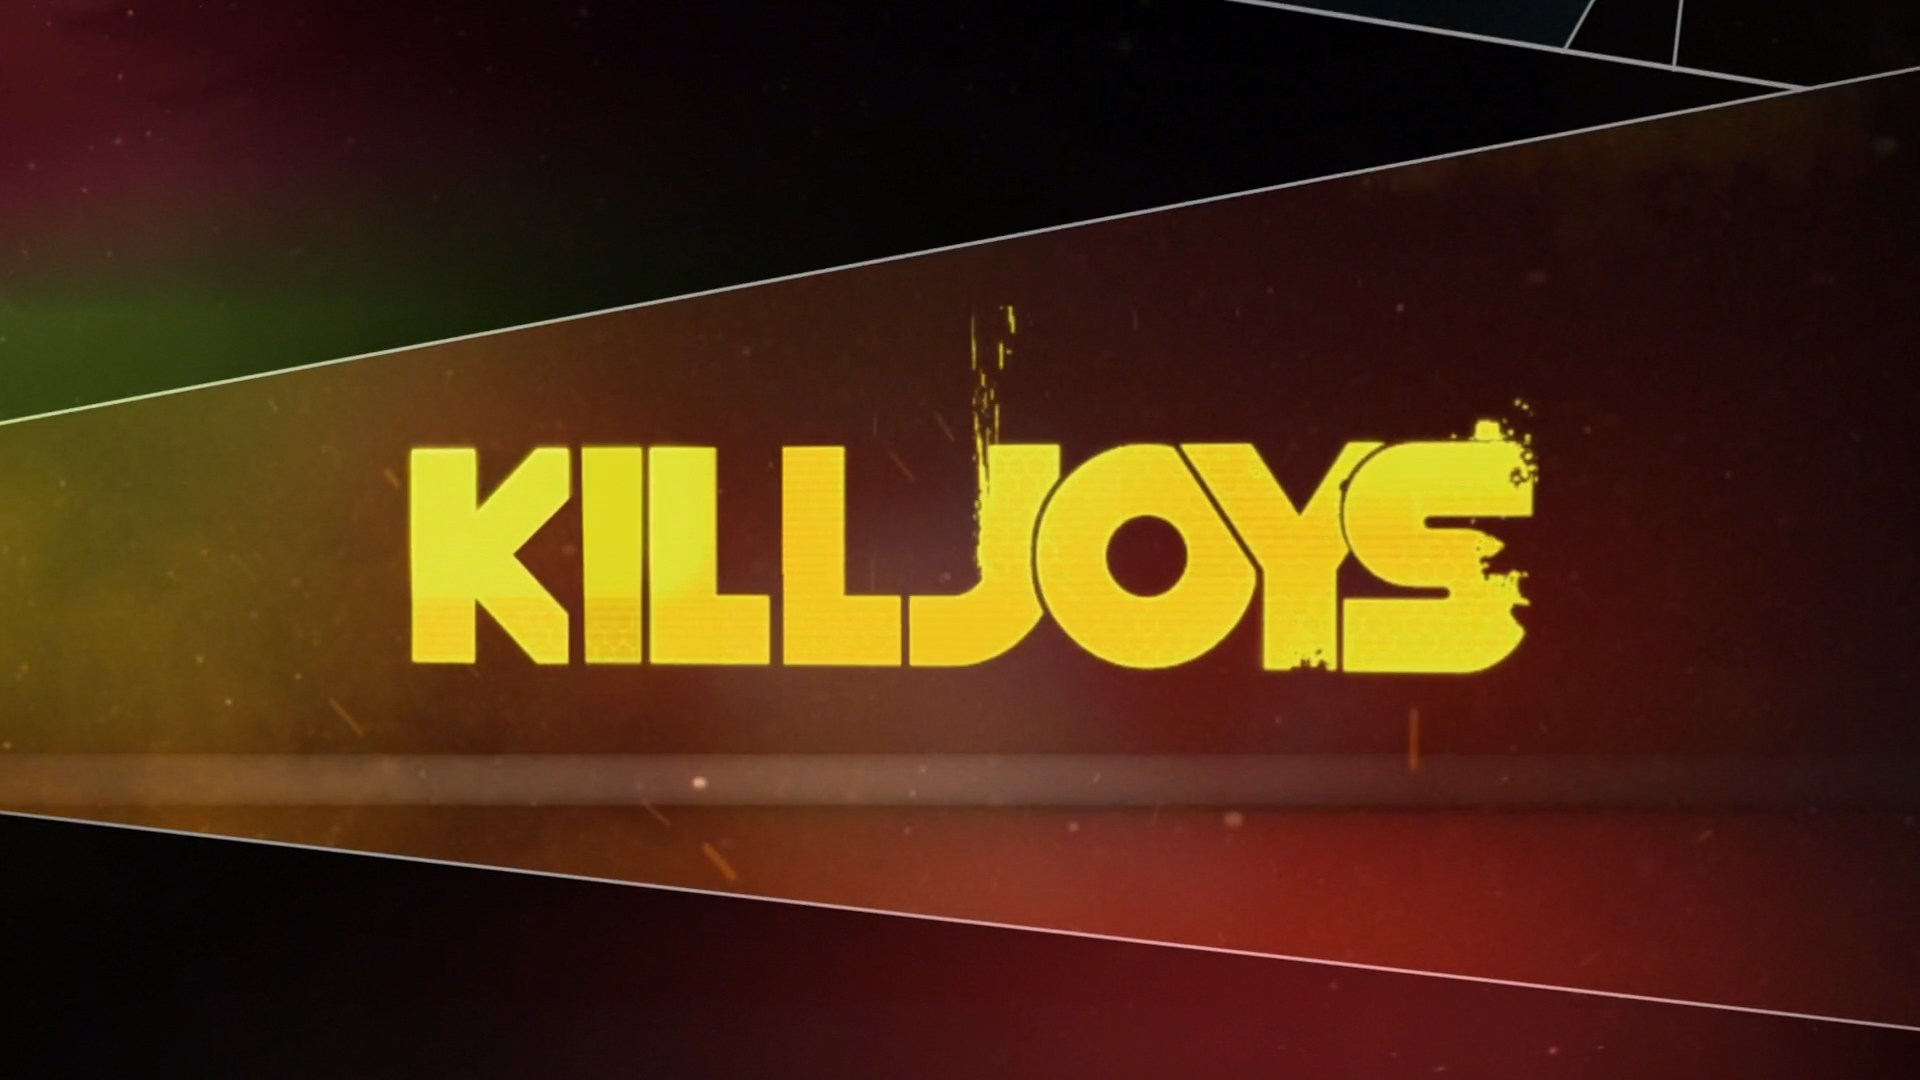 Killjoys.S01E01.1080p.WEB-DL.DD5.1.H.264-RARBG.mkv_snapshot_04.27_[2015.06.28_17.59.53]